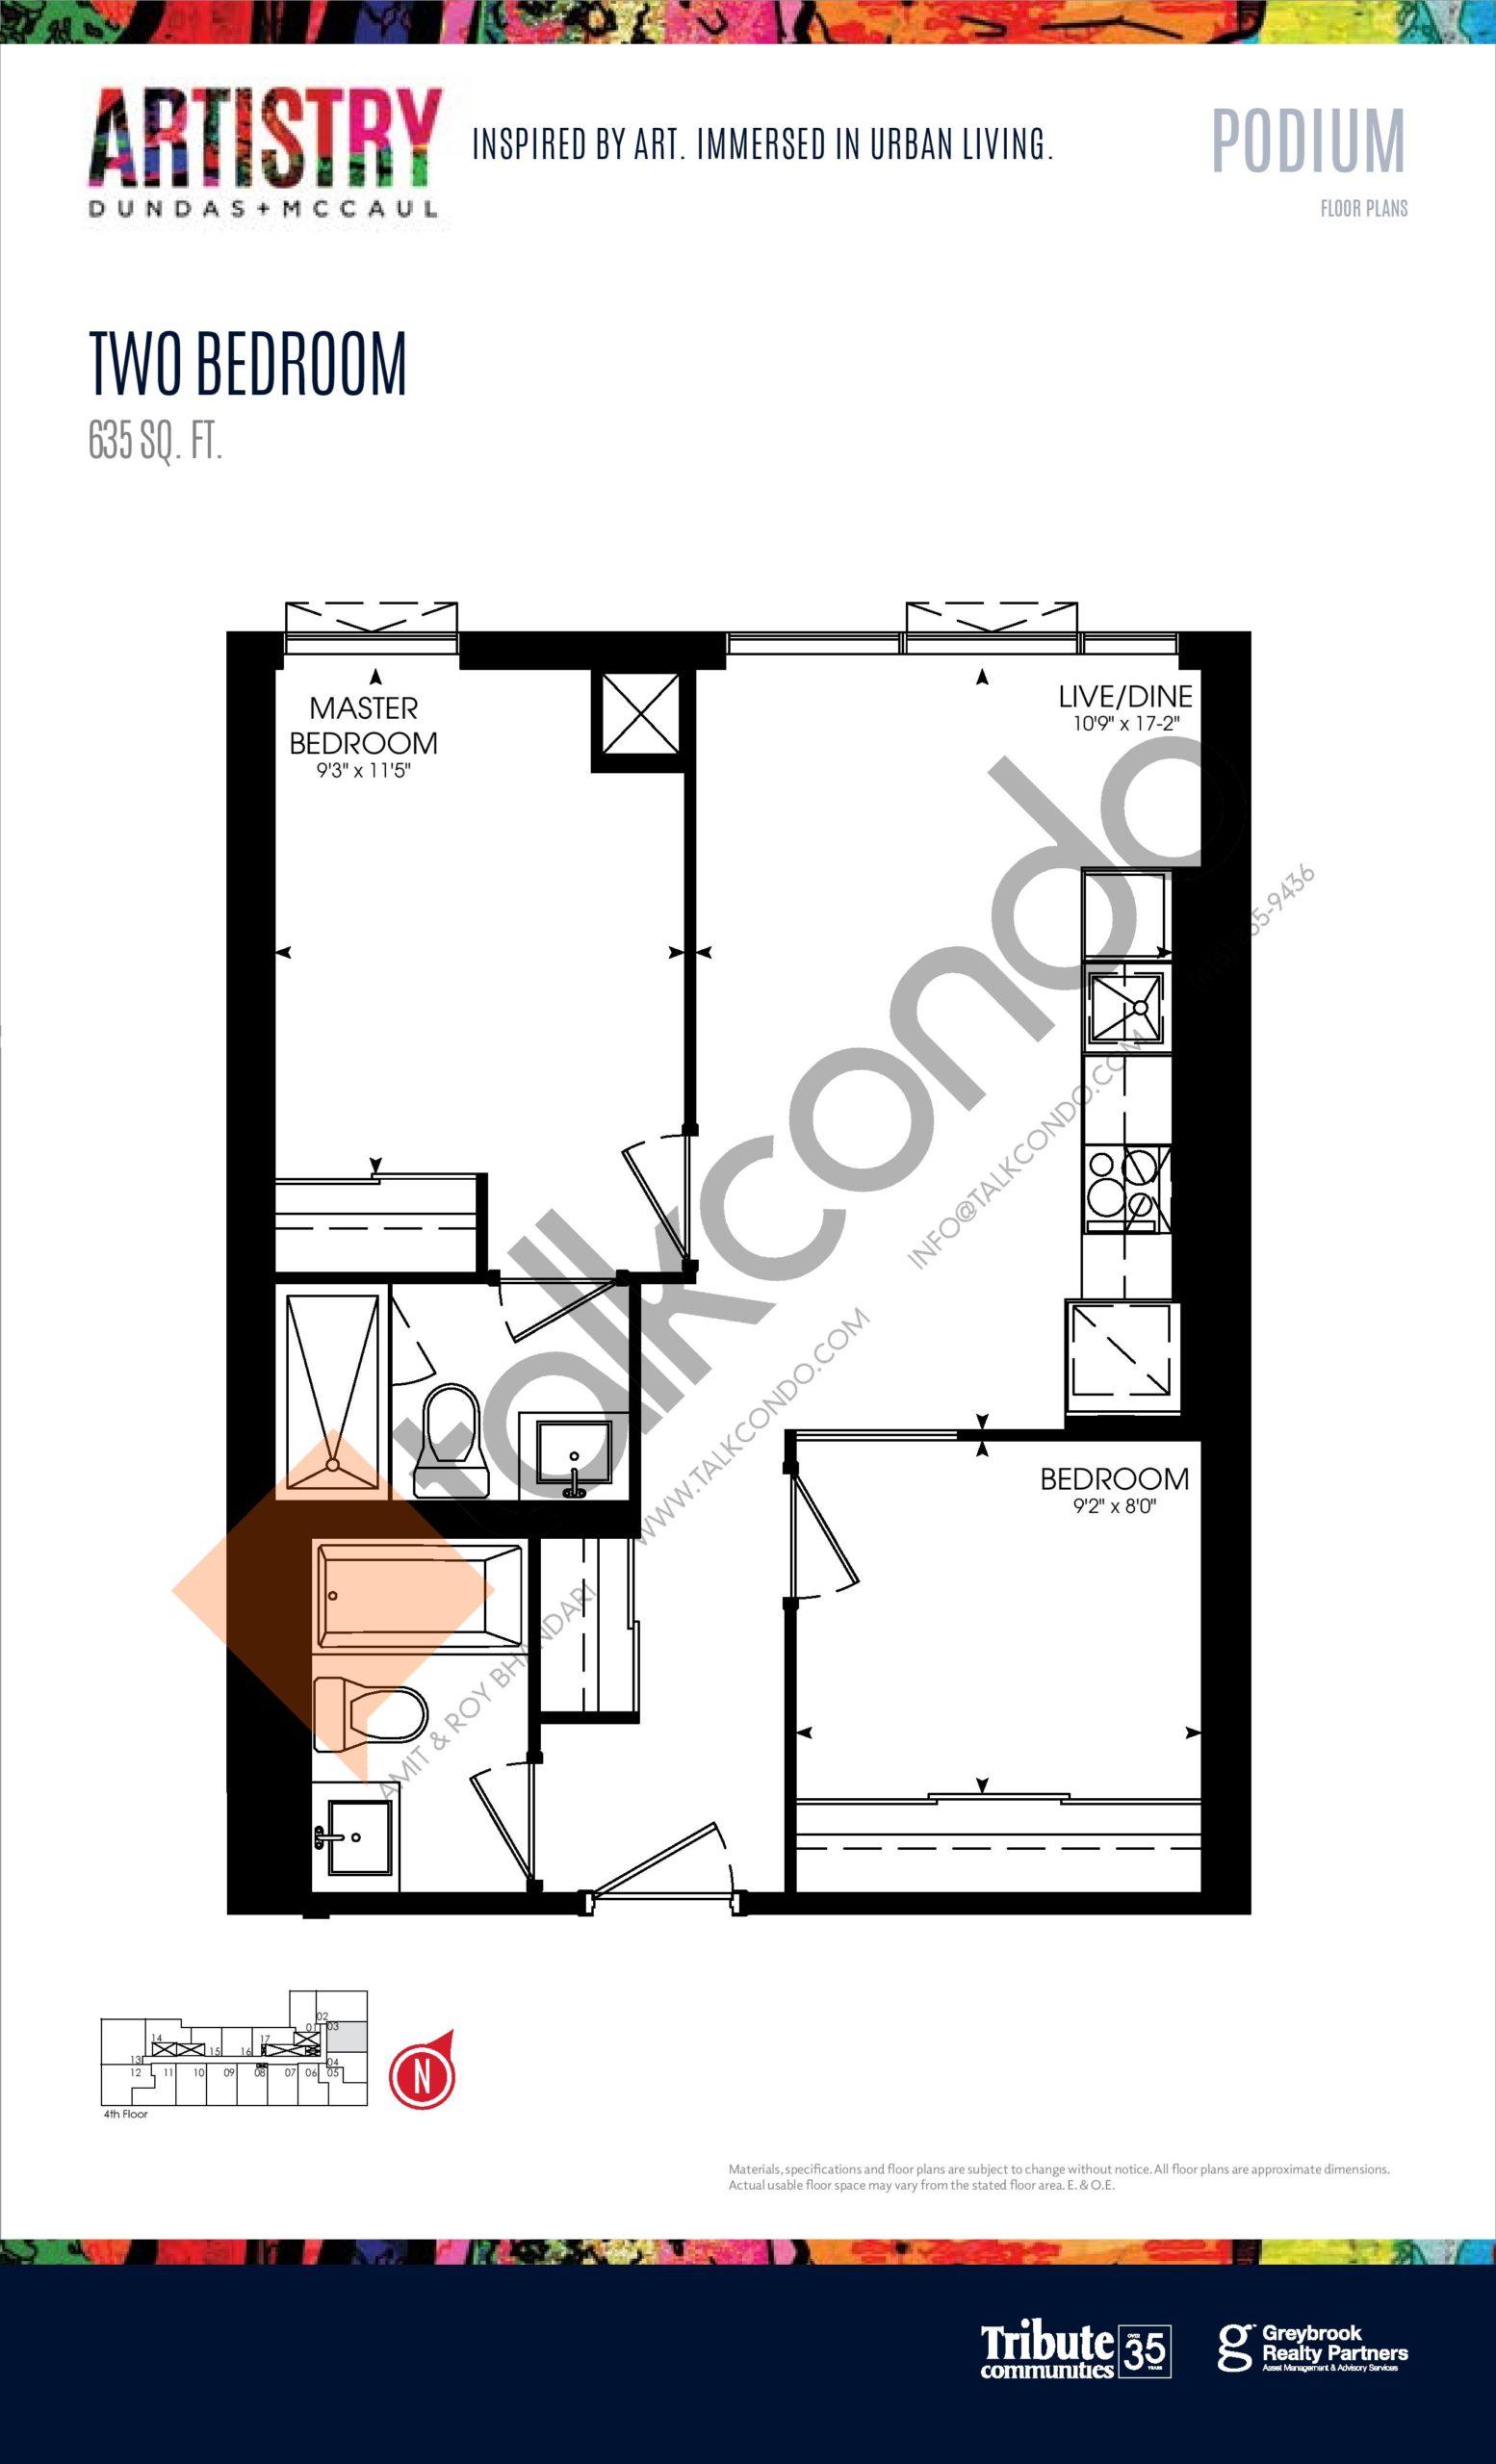 635 sq. ft. - Podium Floor Plan at Artistry Condos - 635 sq.ft